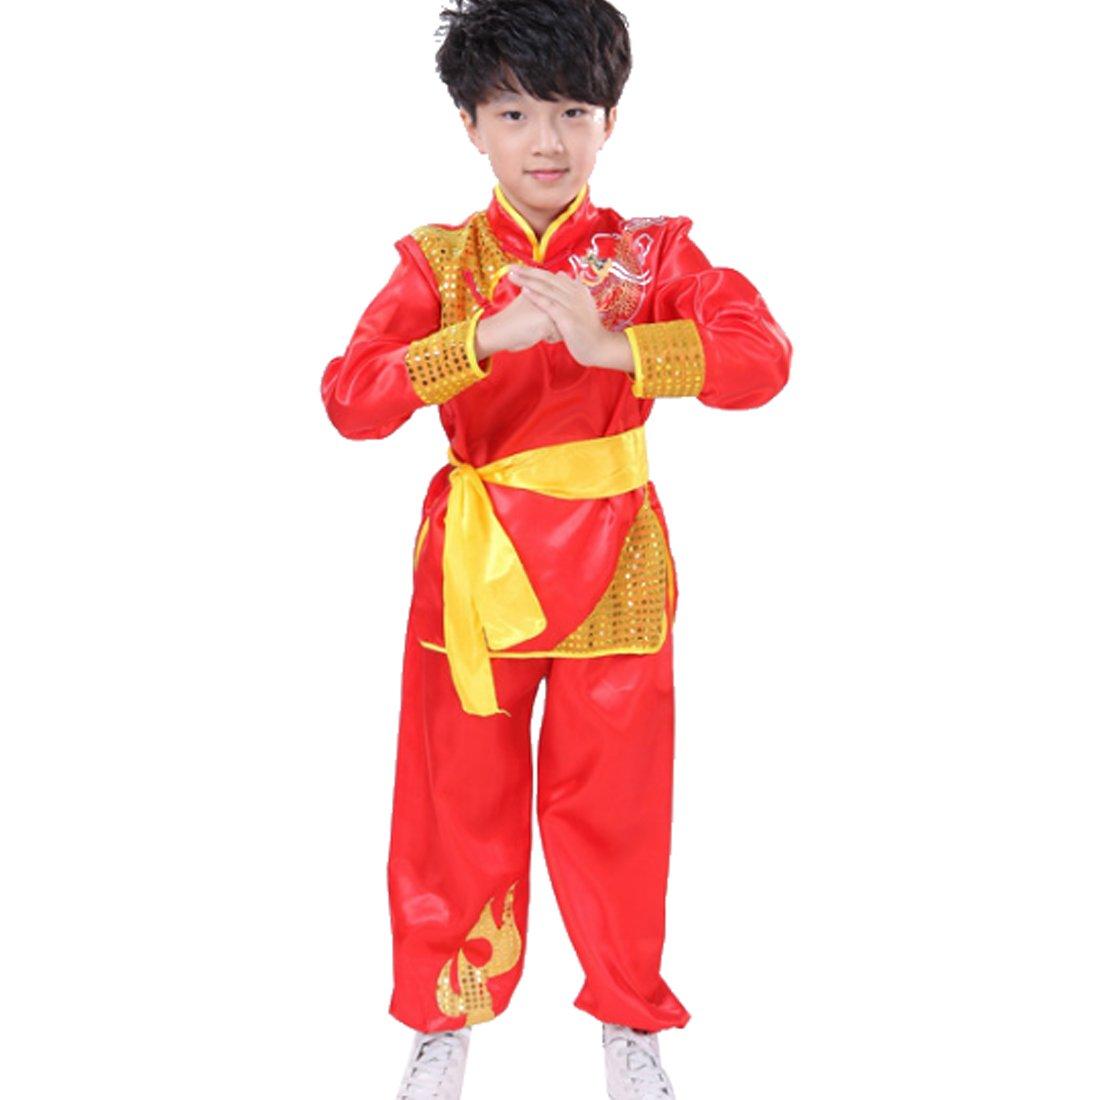 Aiweijia Boy Girl Martial Arts Clothing Sportswear Kungfu Performance Clothing